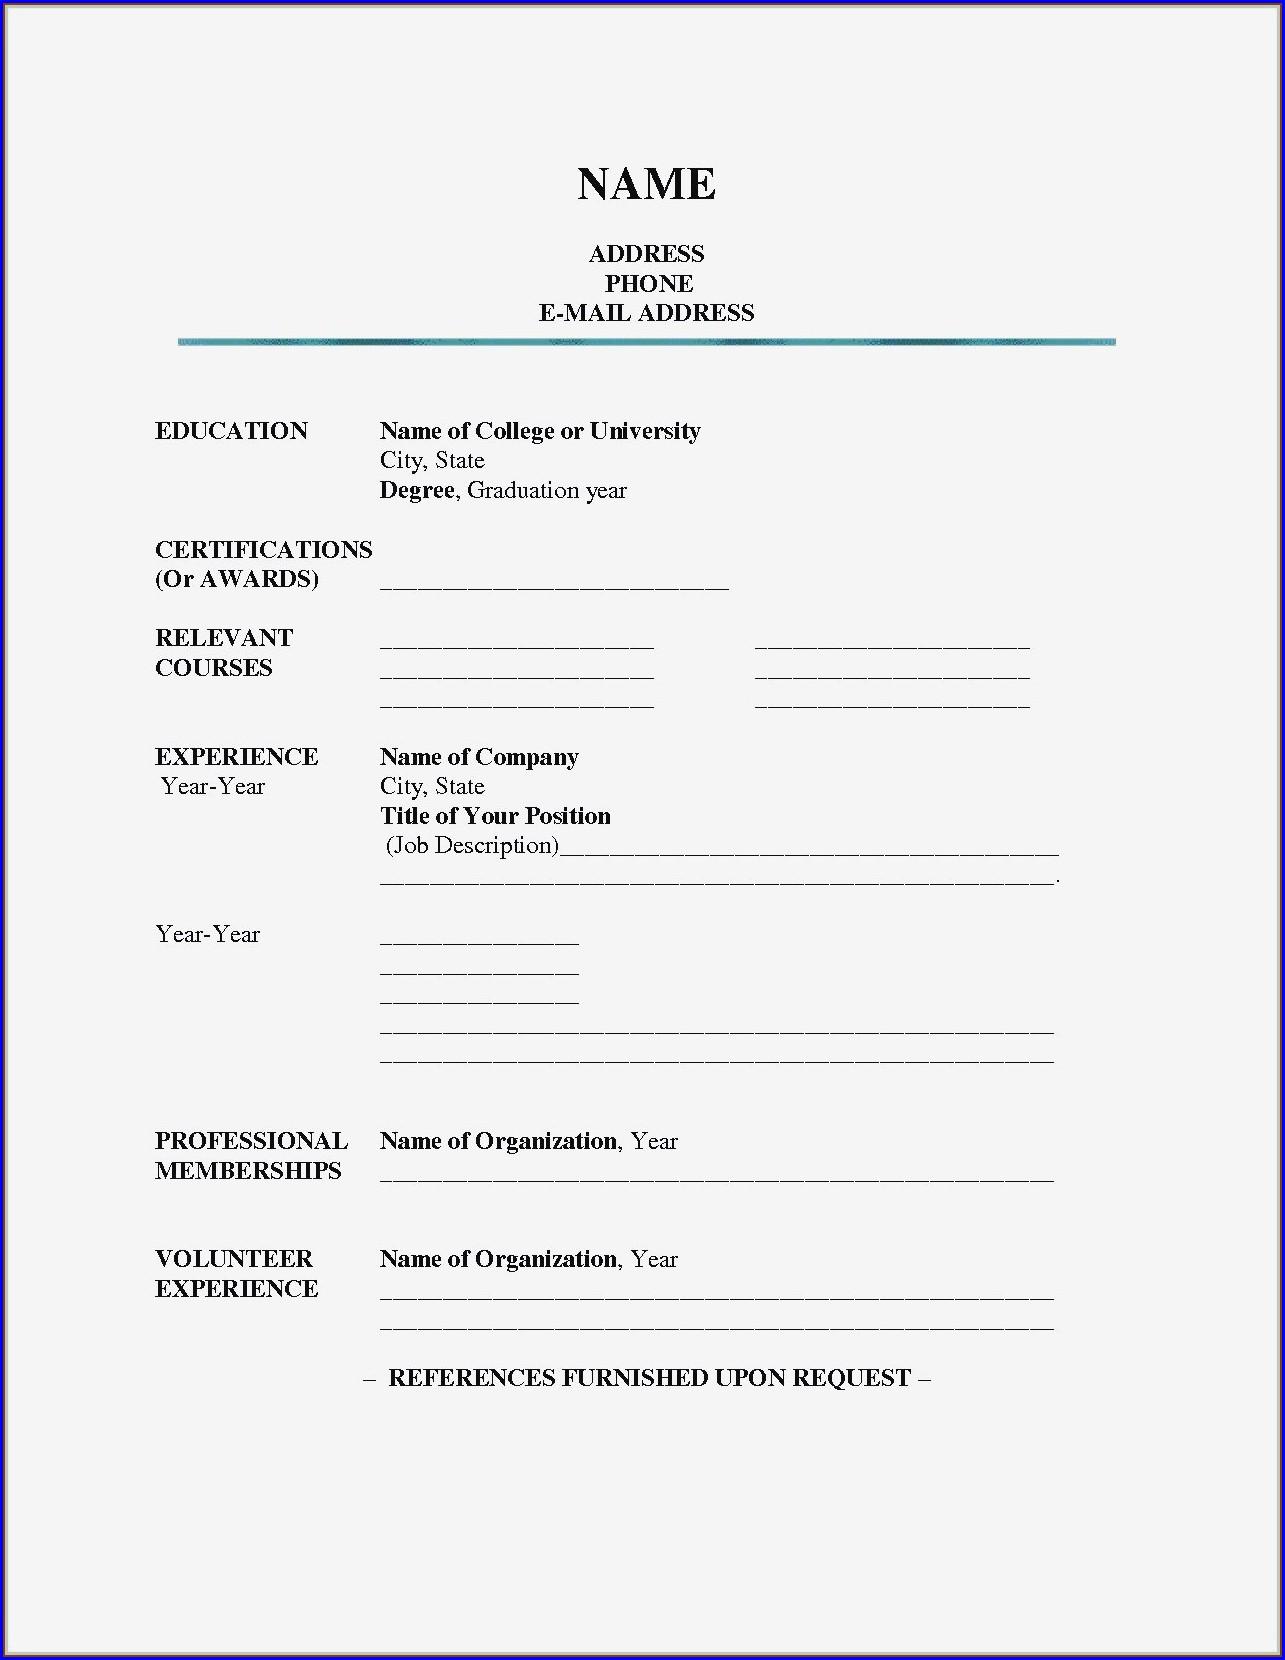 Sample Resume Fill In The Blank Pdf